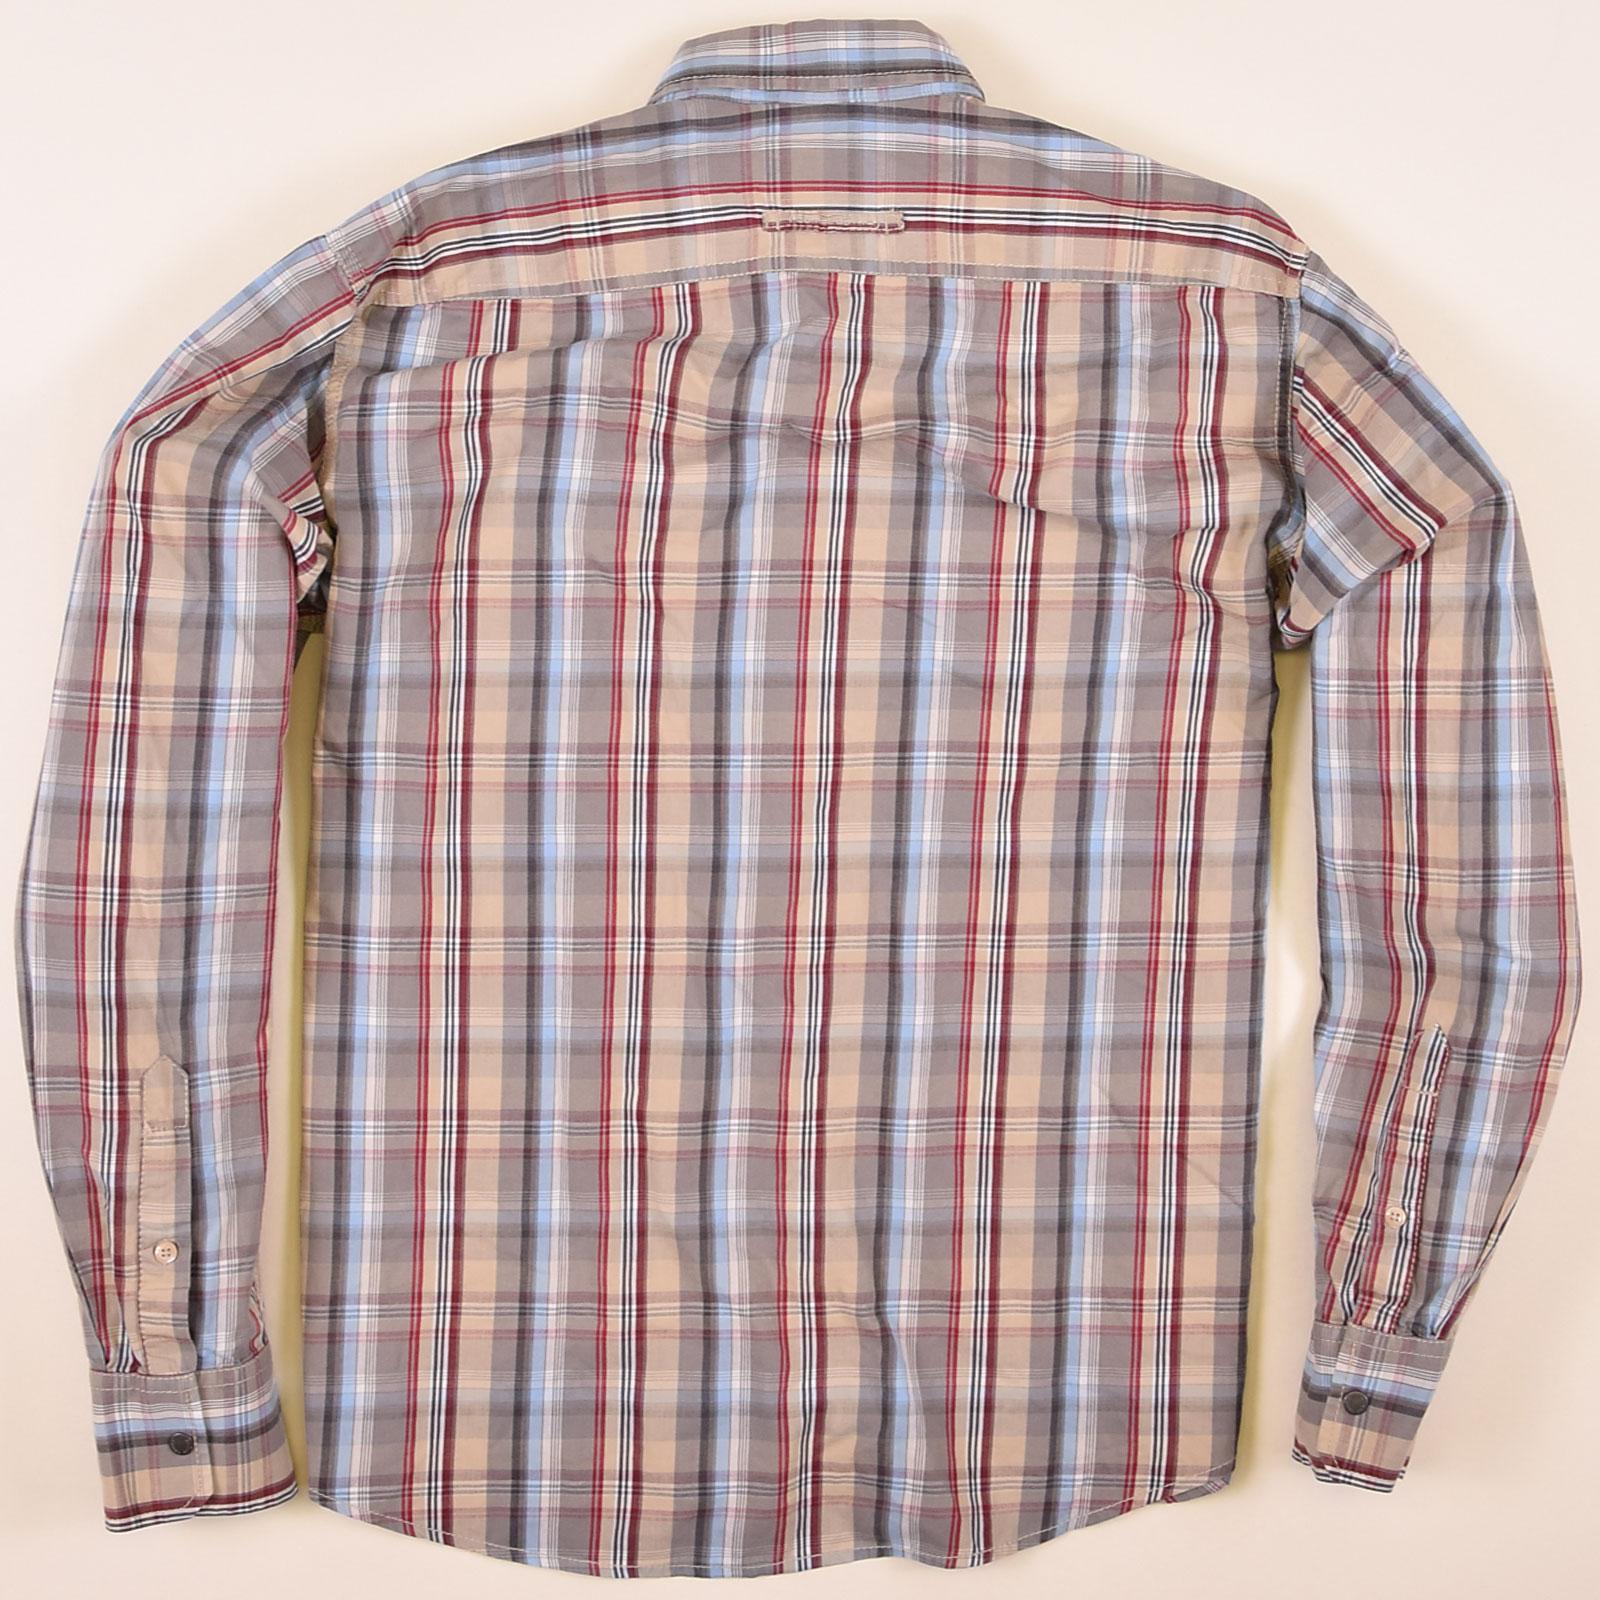 Camel Active Freizeithemd Hemd Shirt Herren Kurzarm Kent Kragen Regular Fit